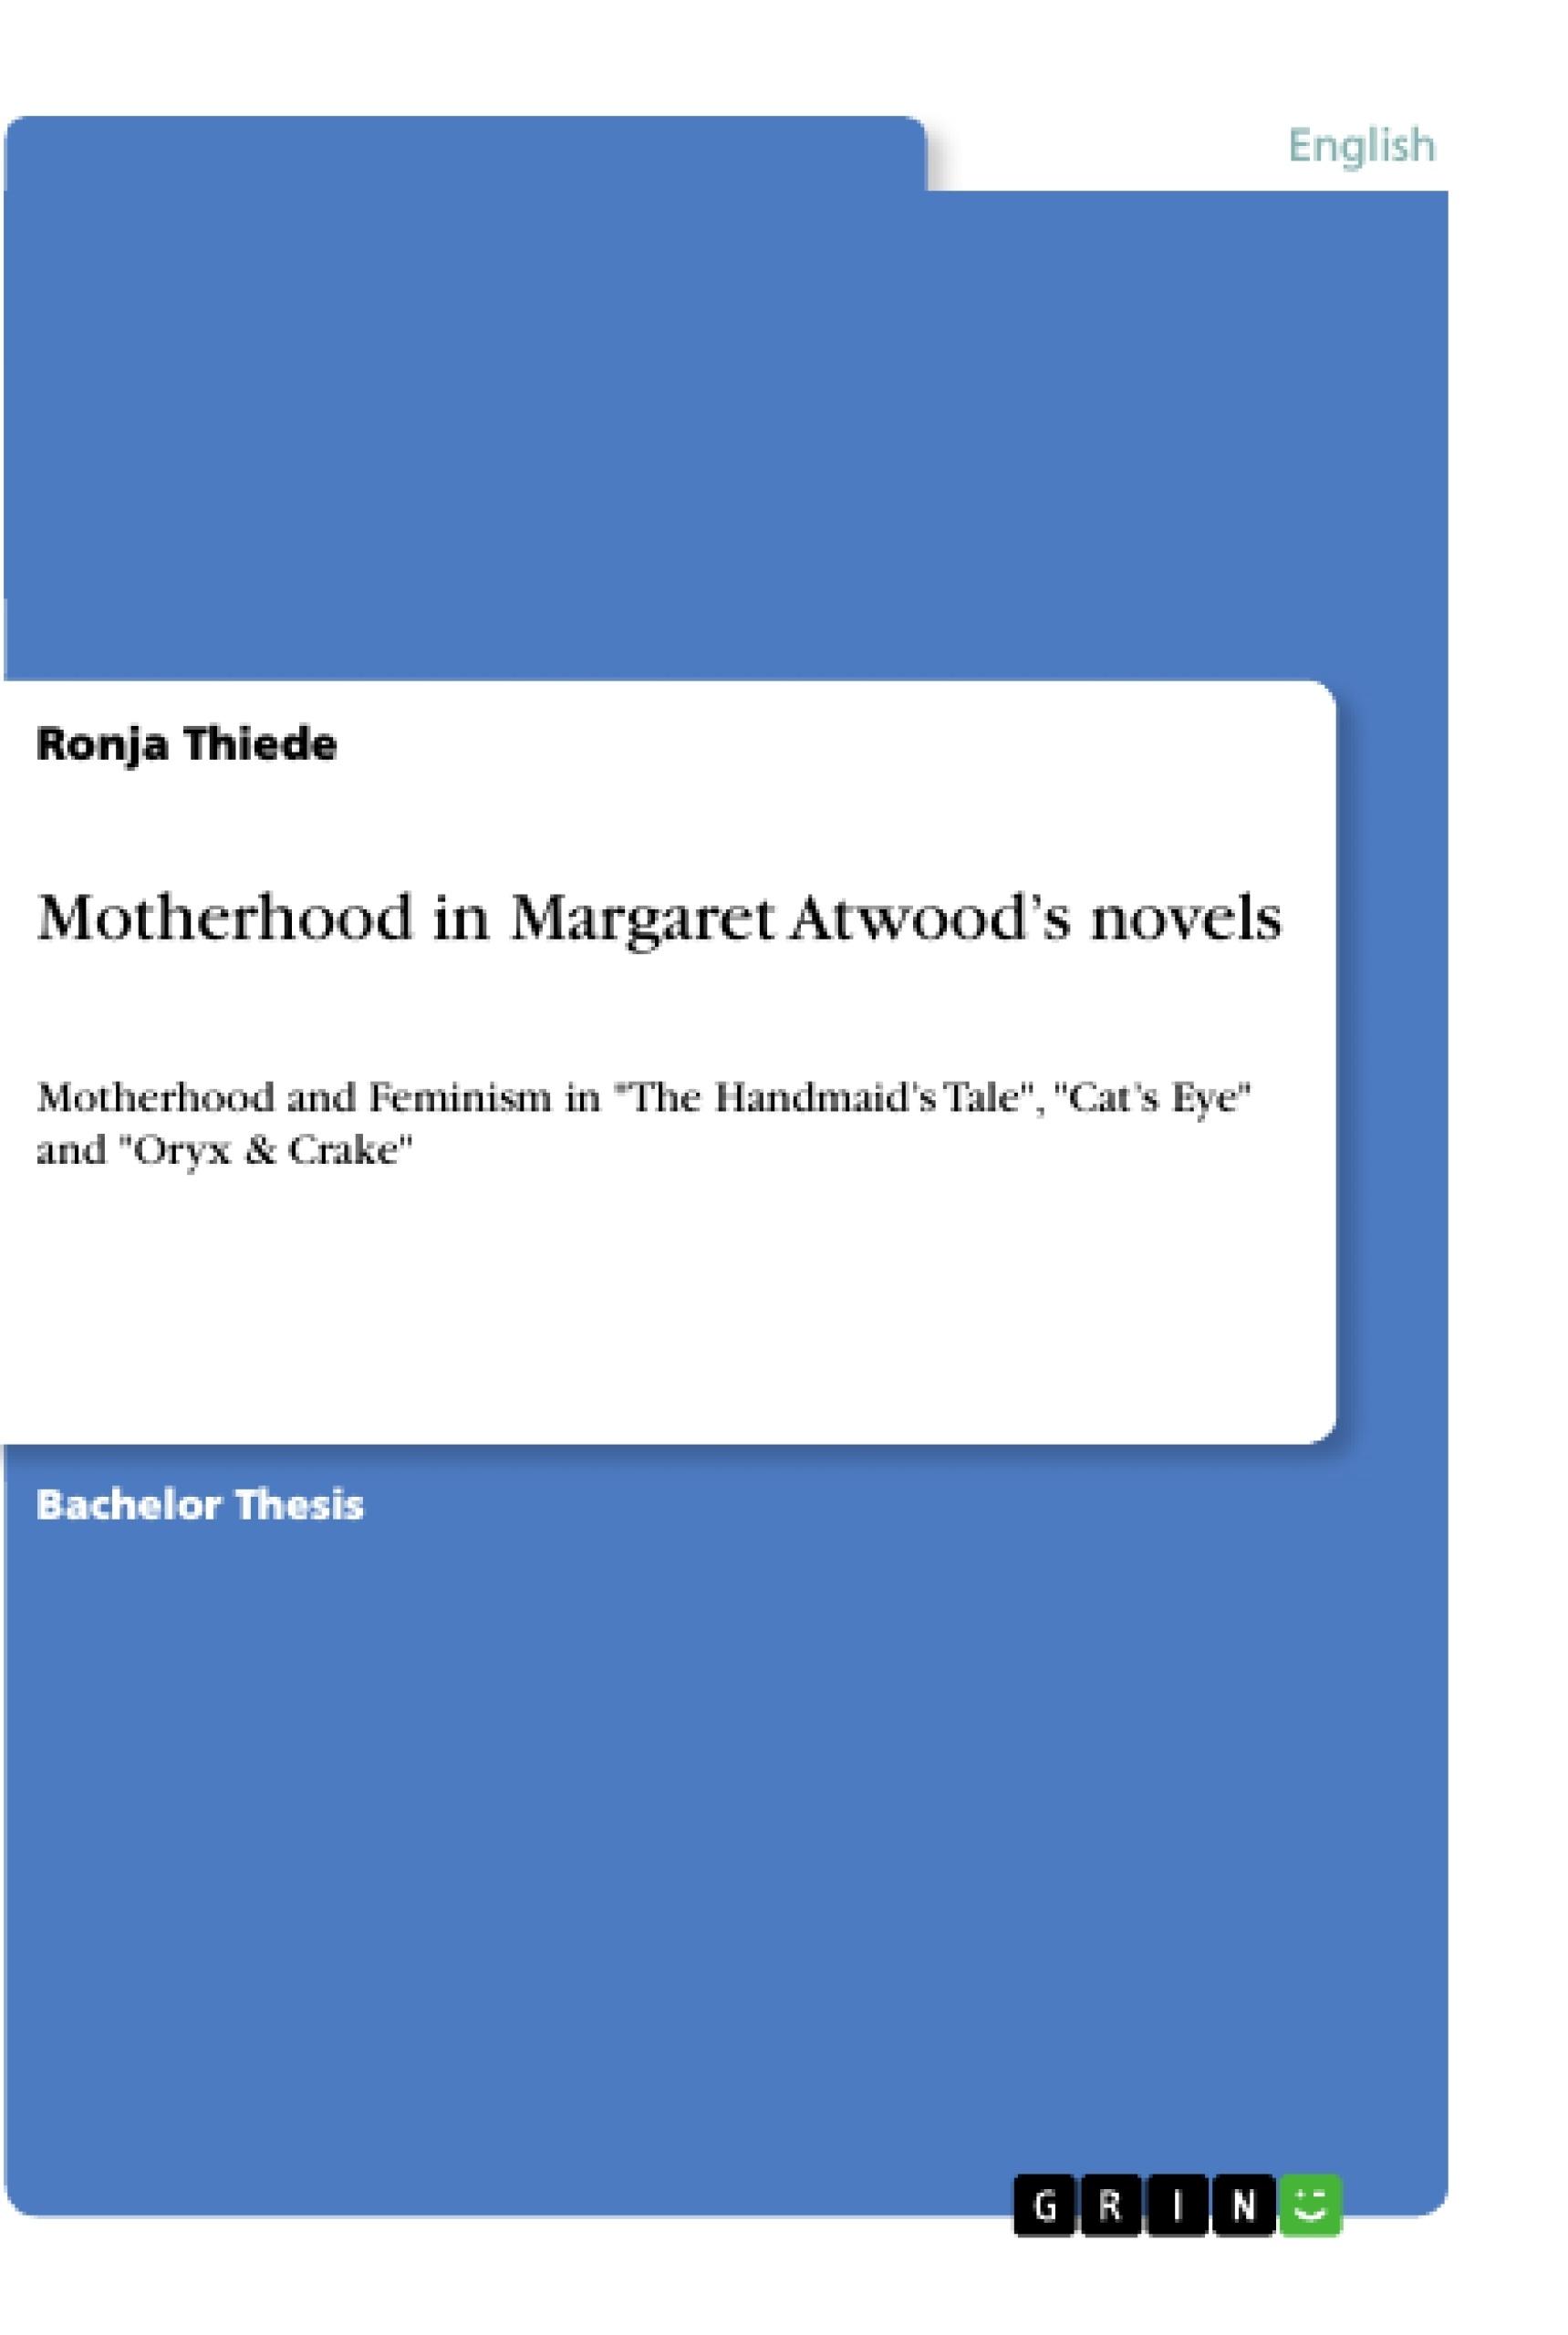 Title: Motherhood in Margaret Atwood's novels